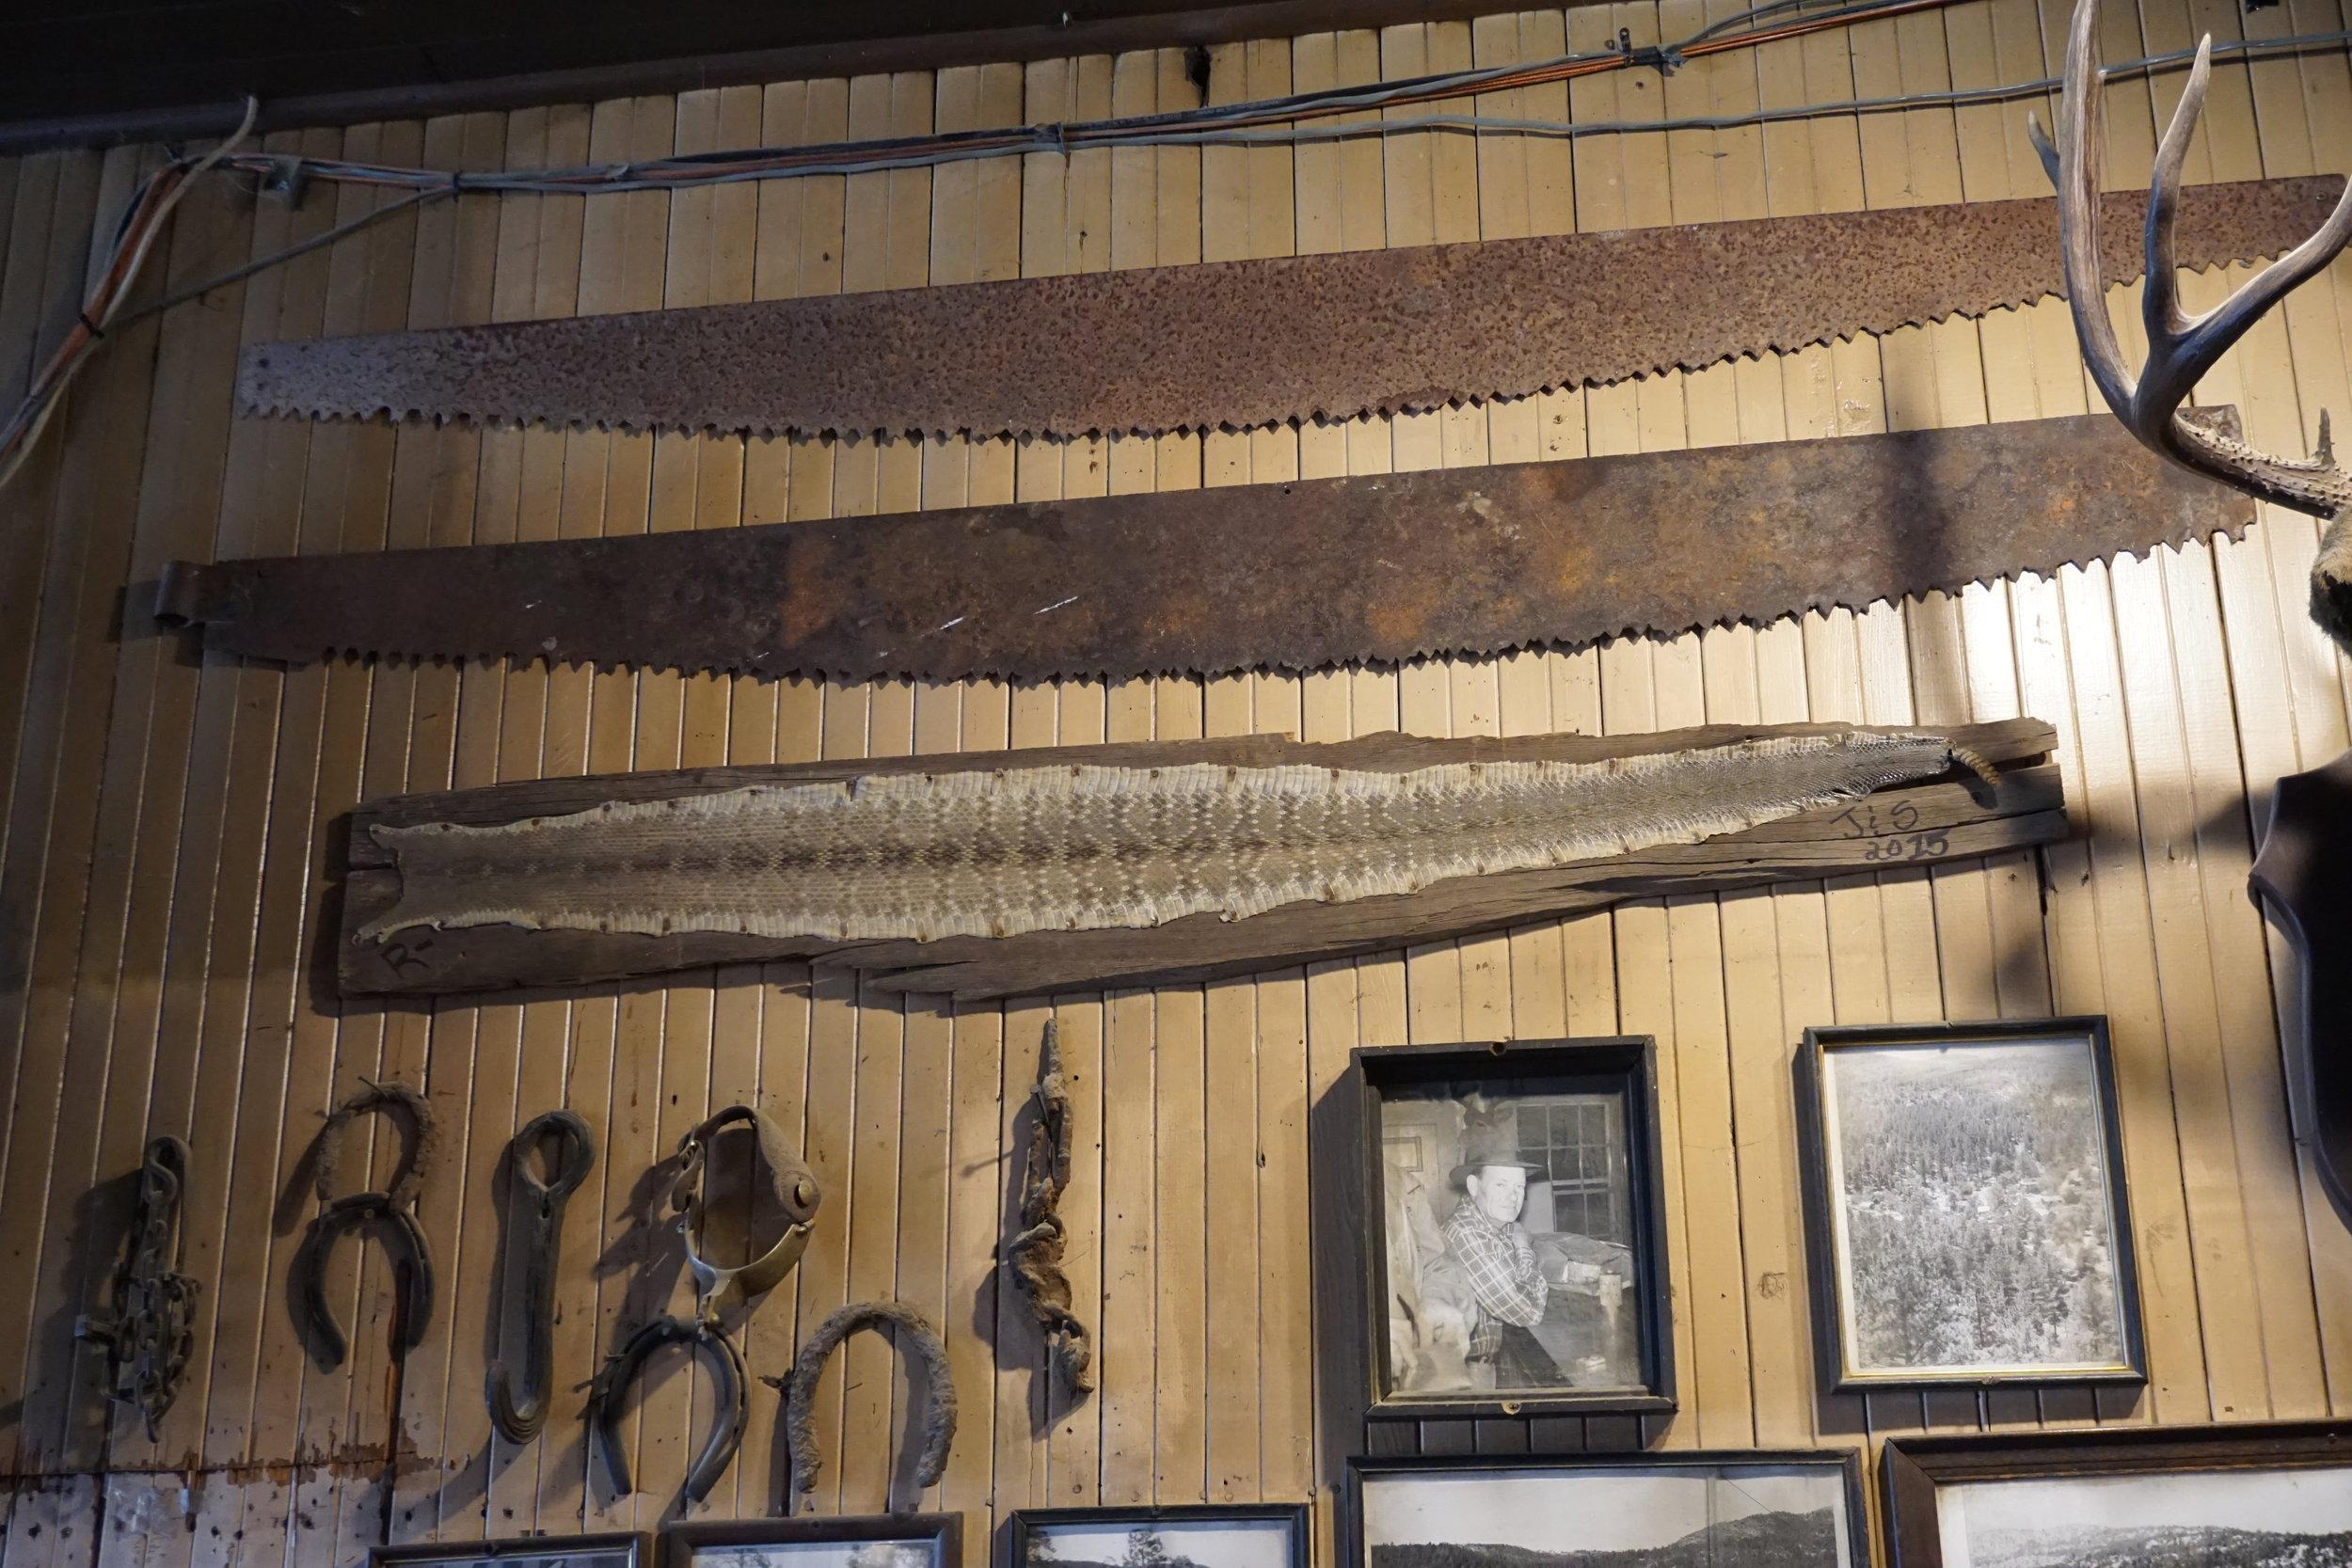 Rattlesnake skin is as big as a two-man saw!